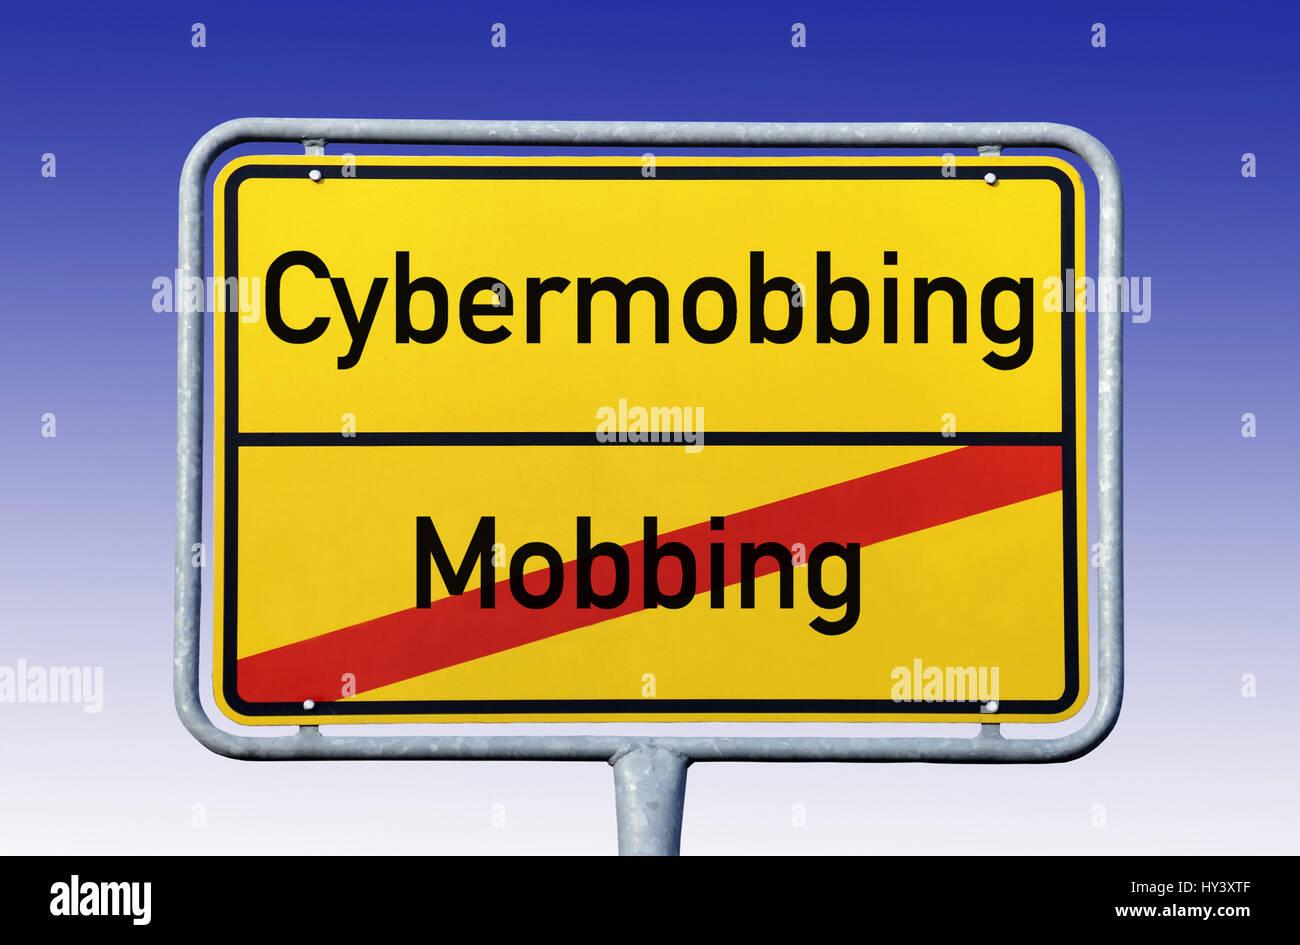 cybermobbing referat powerpoint